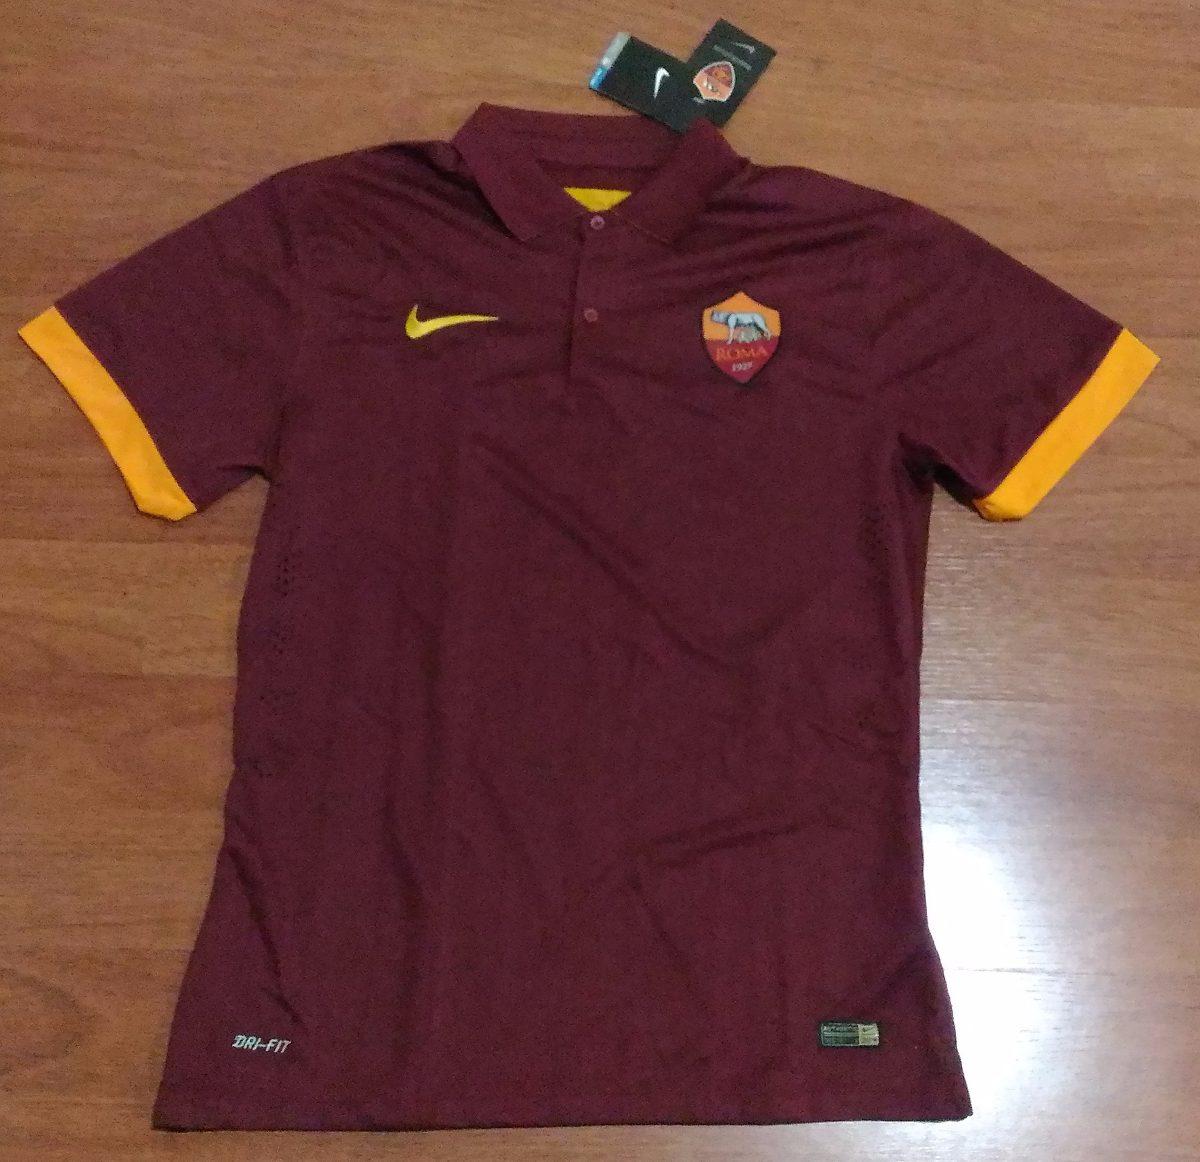 7cb8080808f26 Camisa Oficial Roma (itália) 2014 15 Tam. Xg Pjanic Nº 15 - R  95